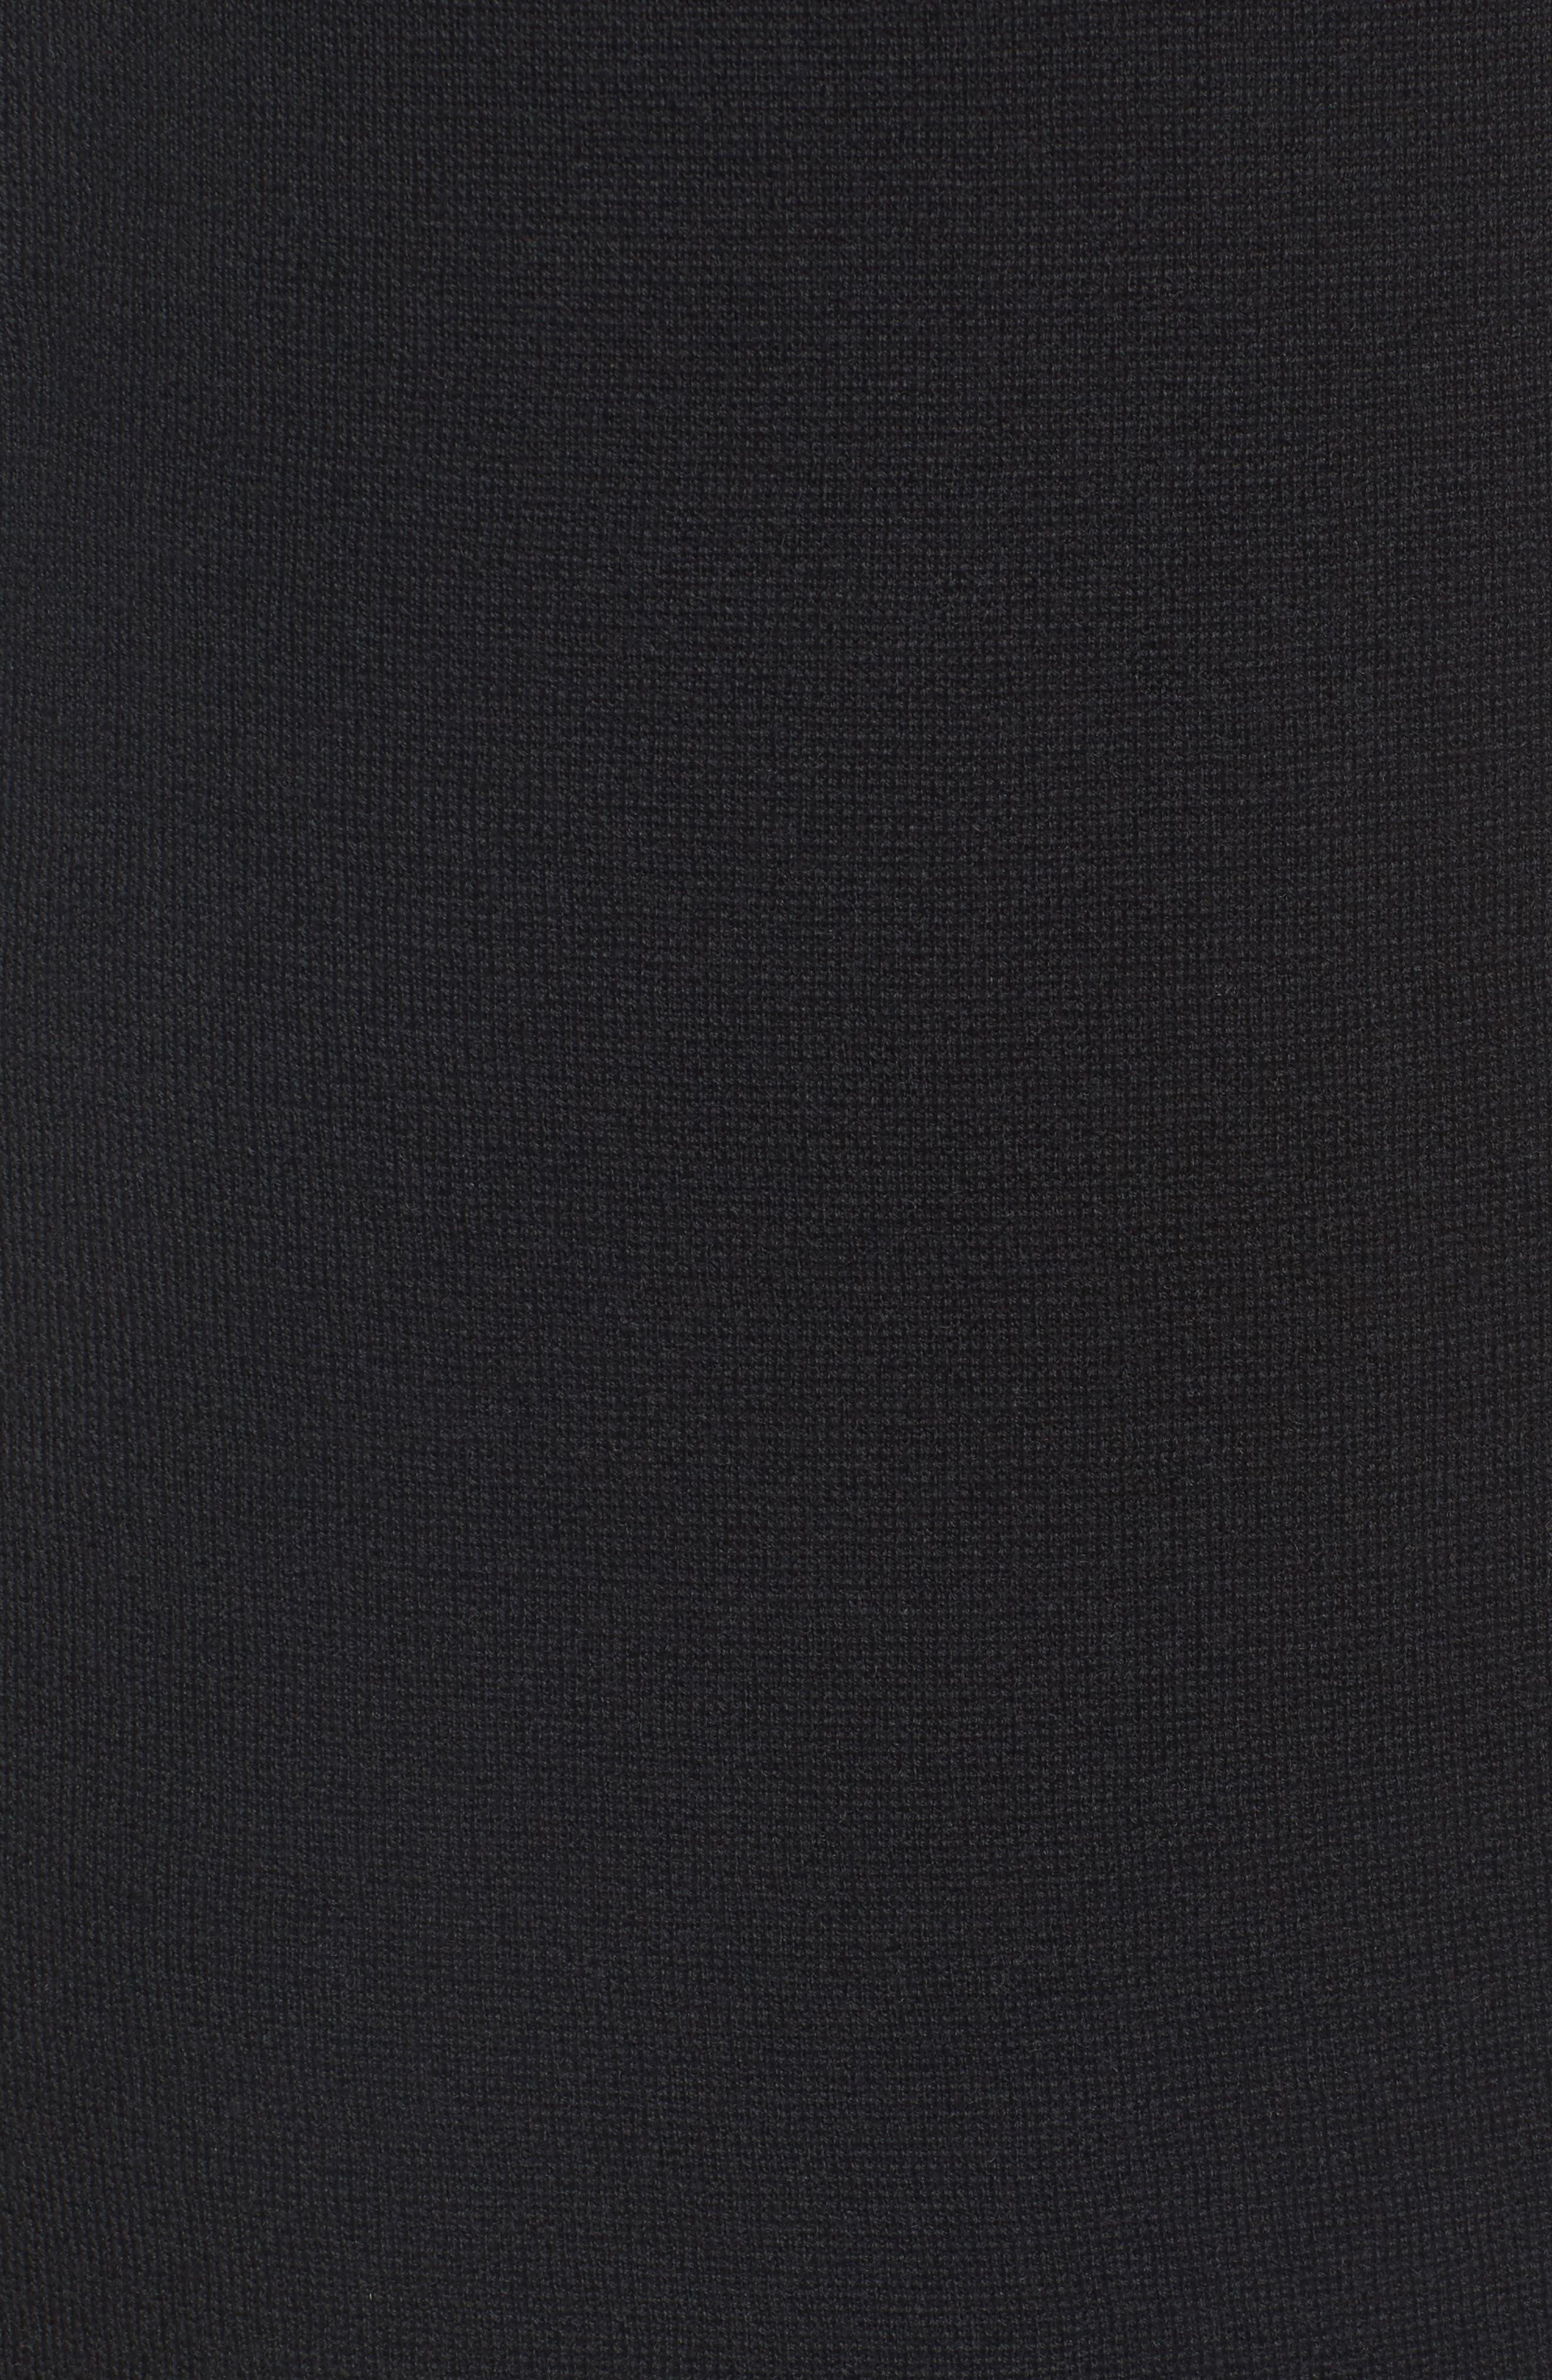 Merino Wool Sweater Dress,                             Alternate thumbnail 5, color,                             001